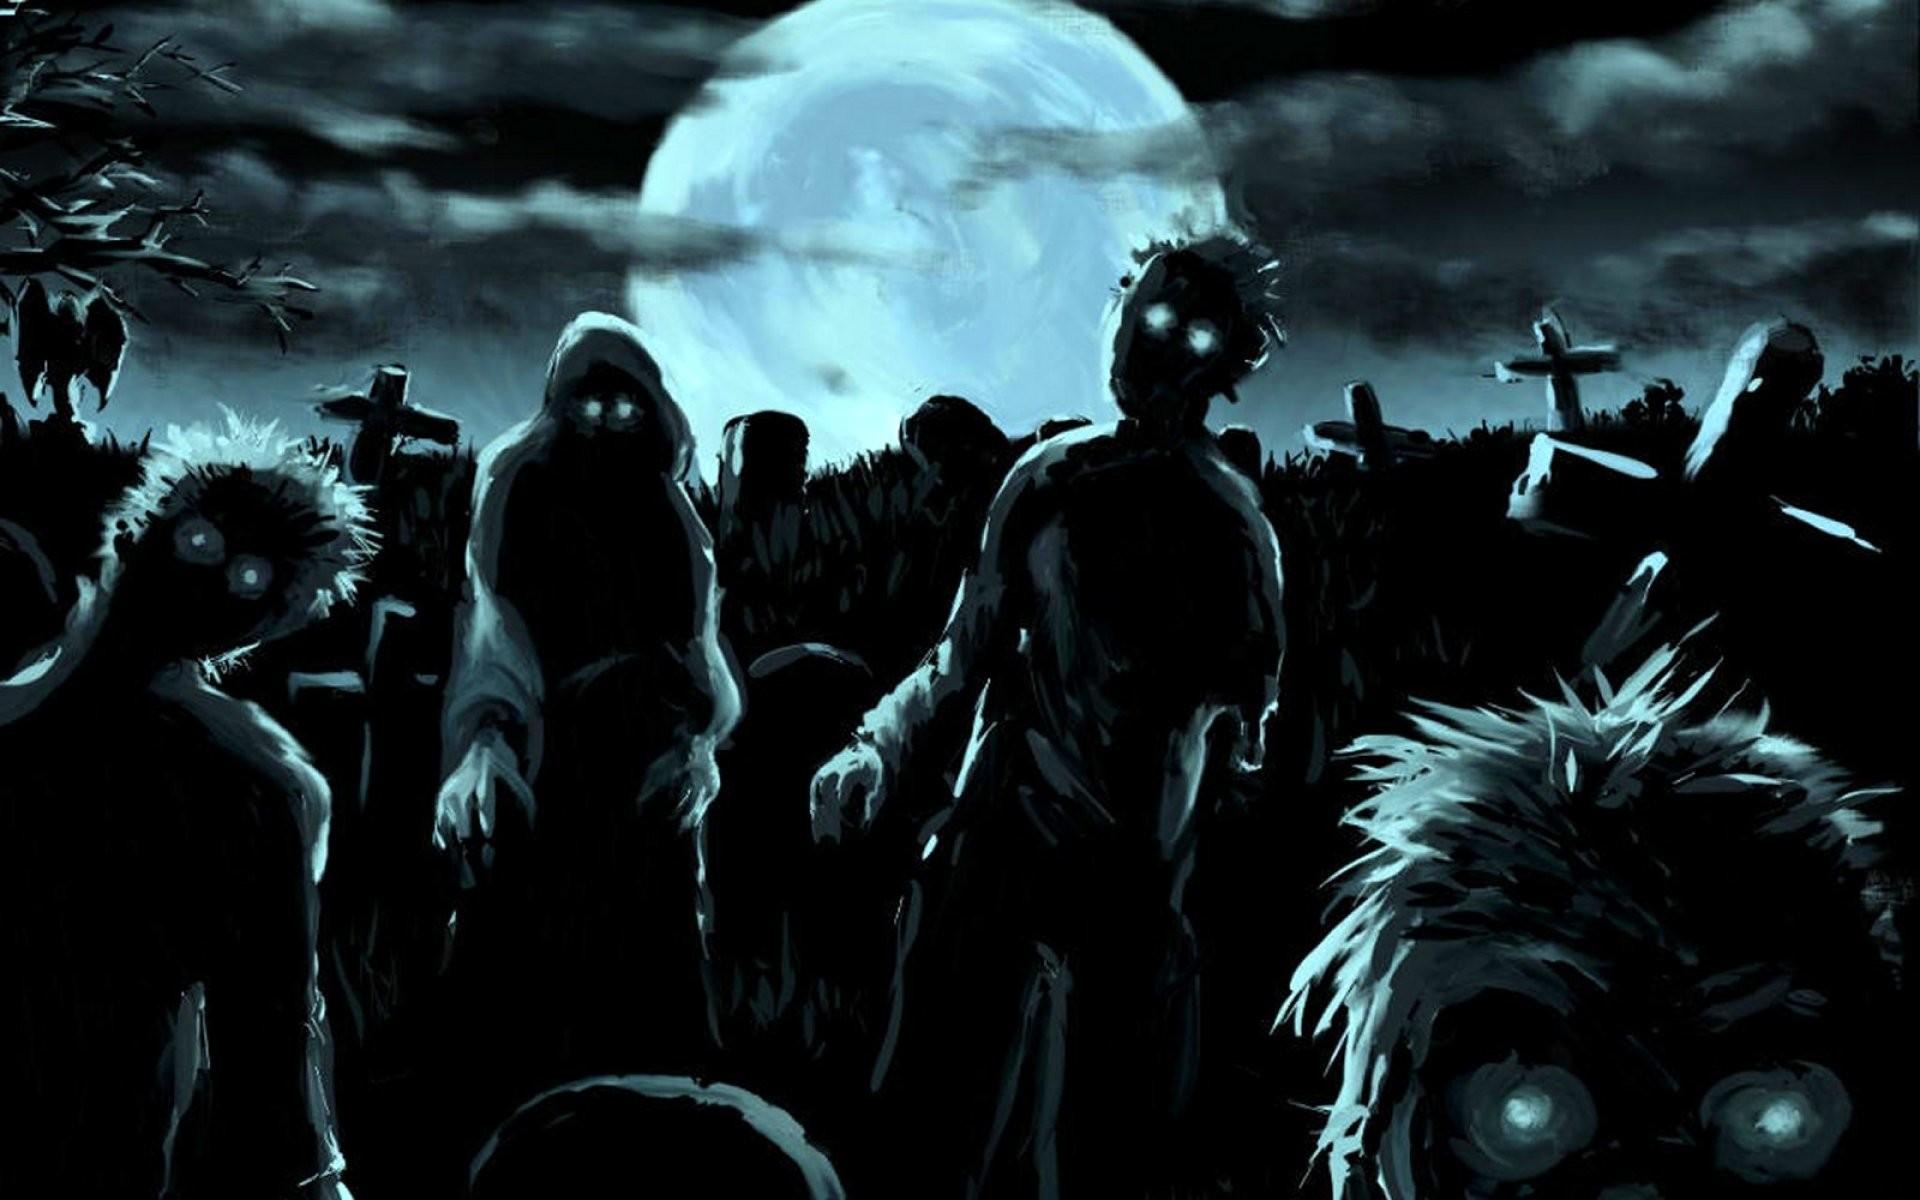 Dark Art Artwork Fantasy Artistic Original Psychedelic Horror Evil Creepy  Scary Spooky Halloween Wallpaper At Dark Wallpapers